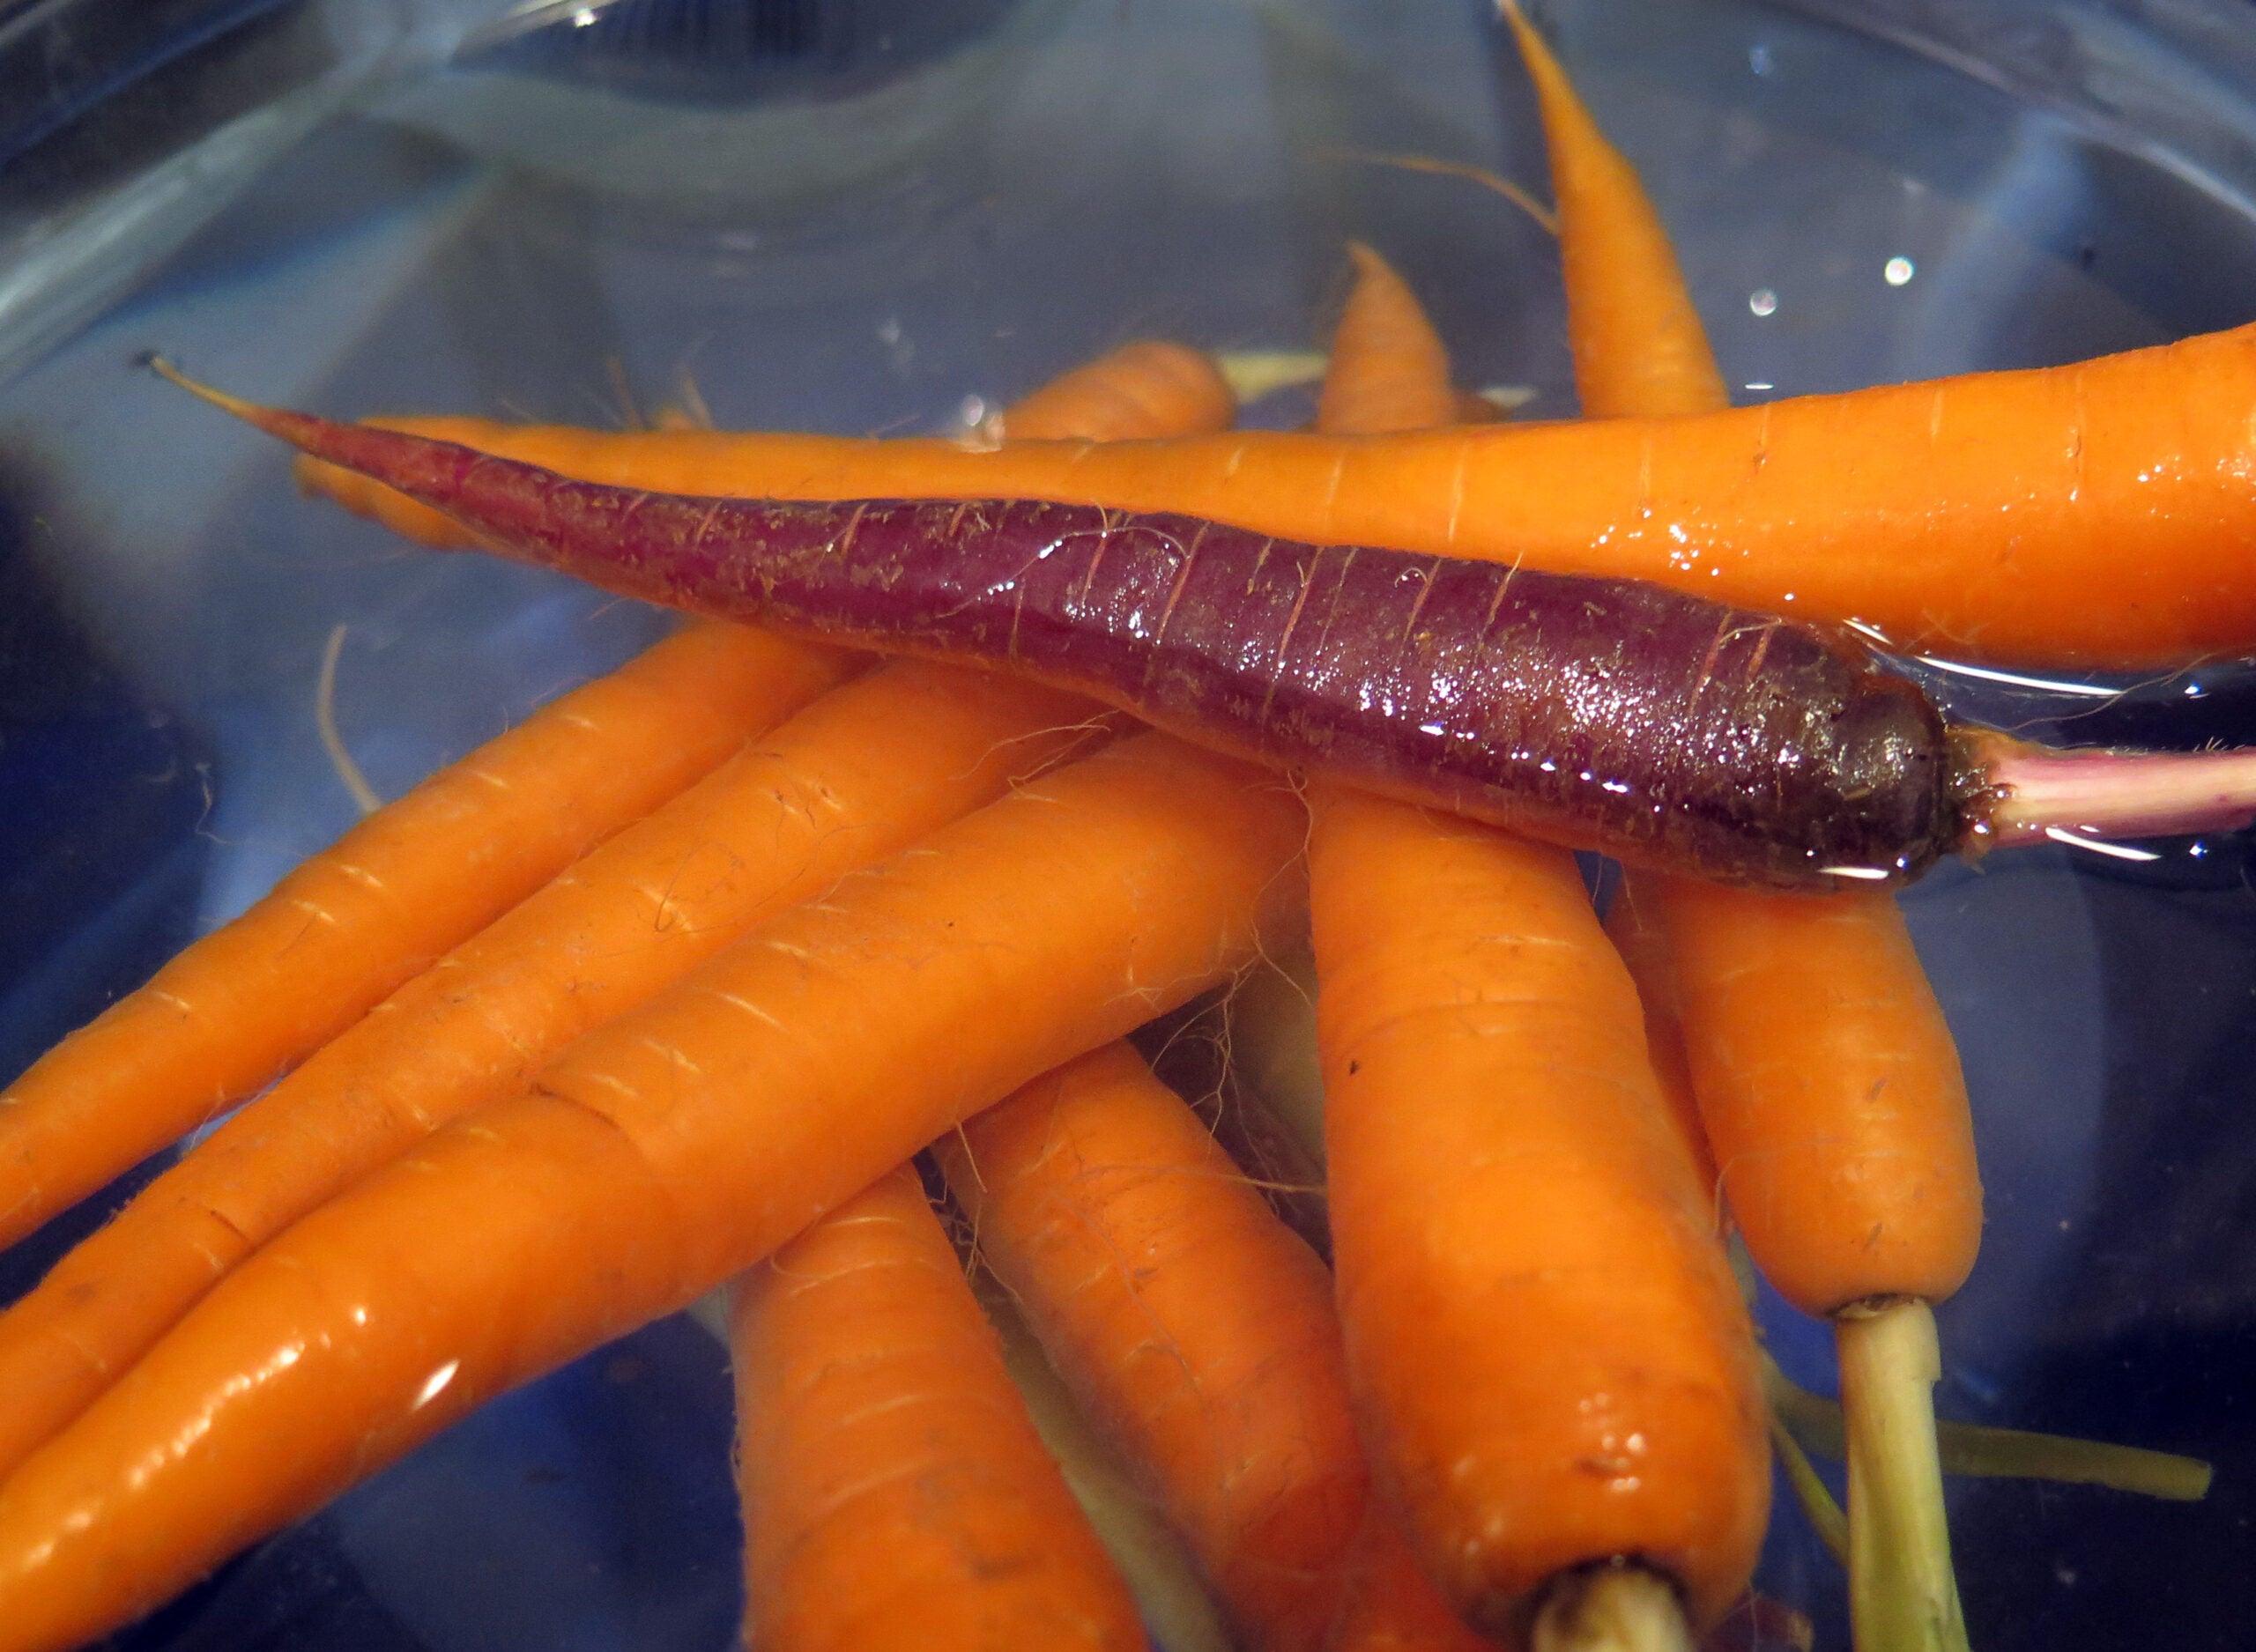 purple and orange carrots